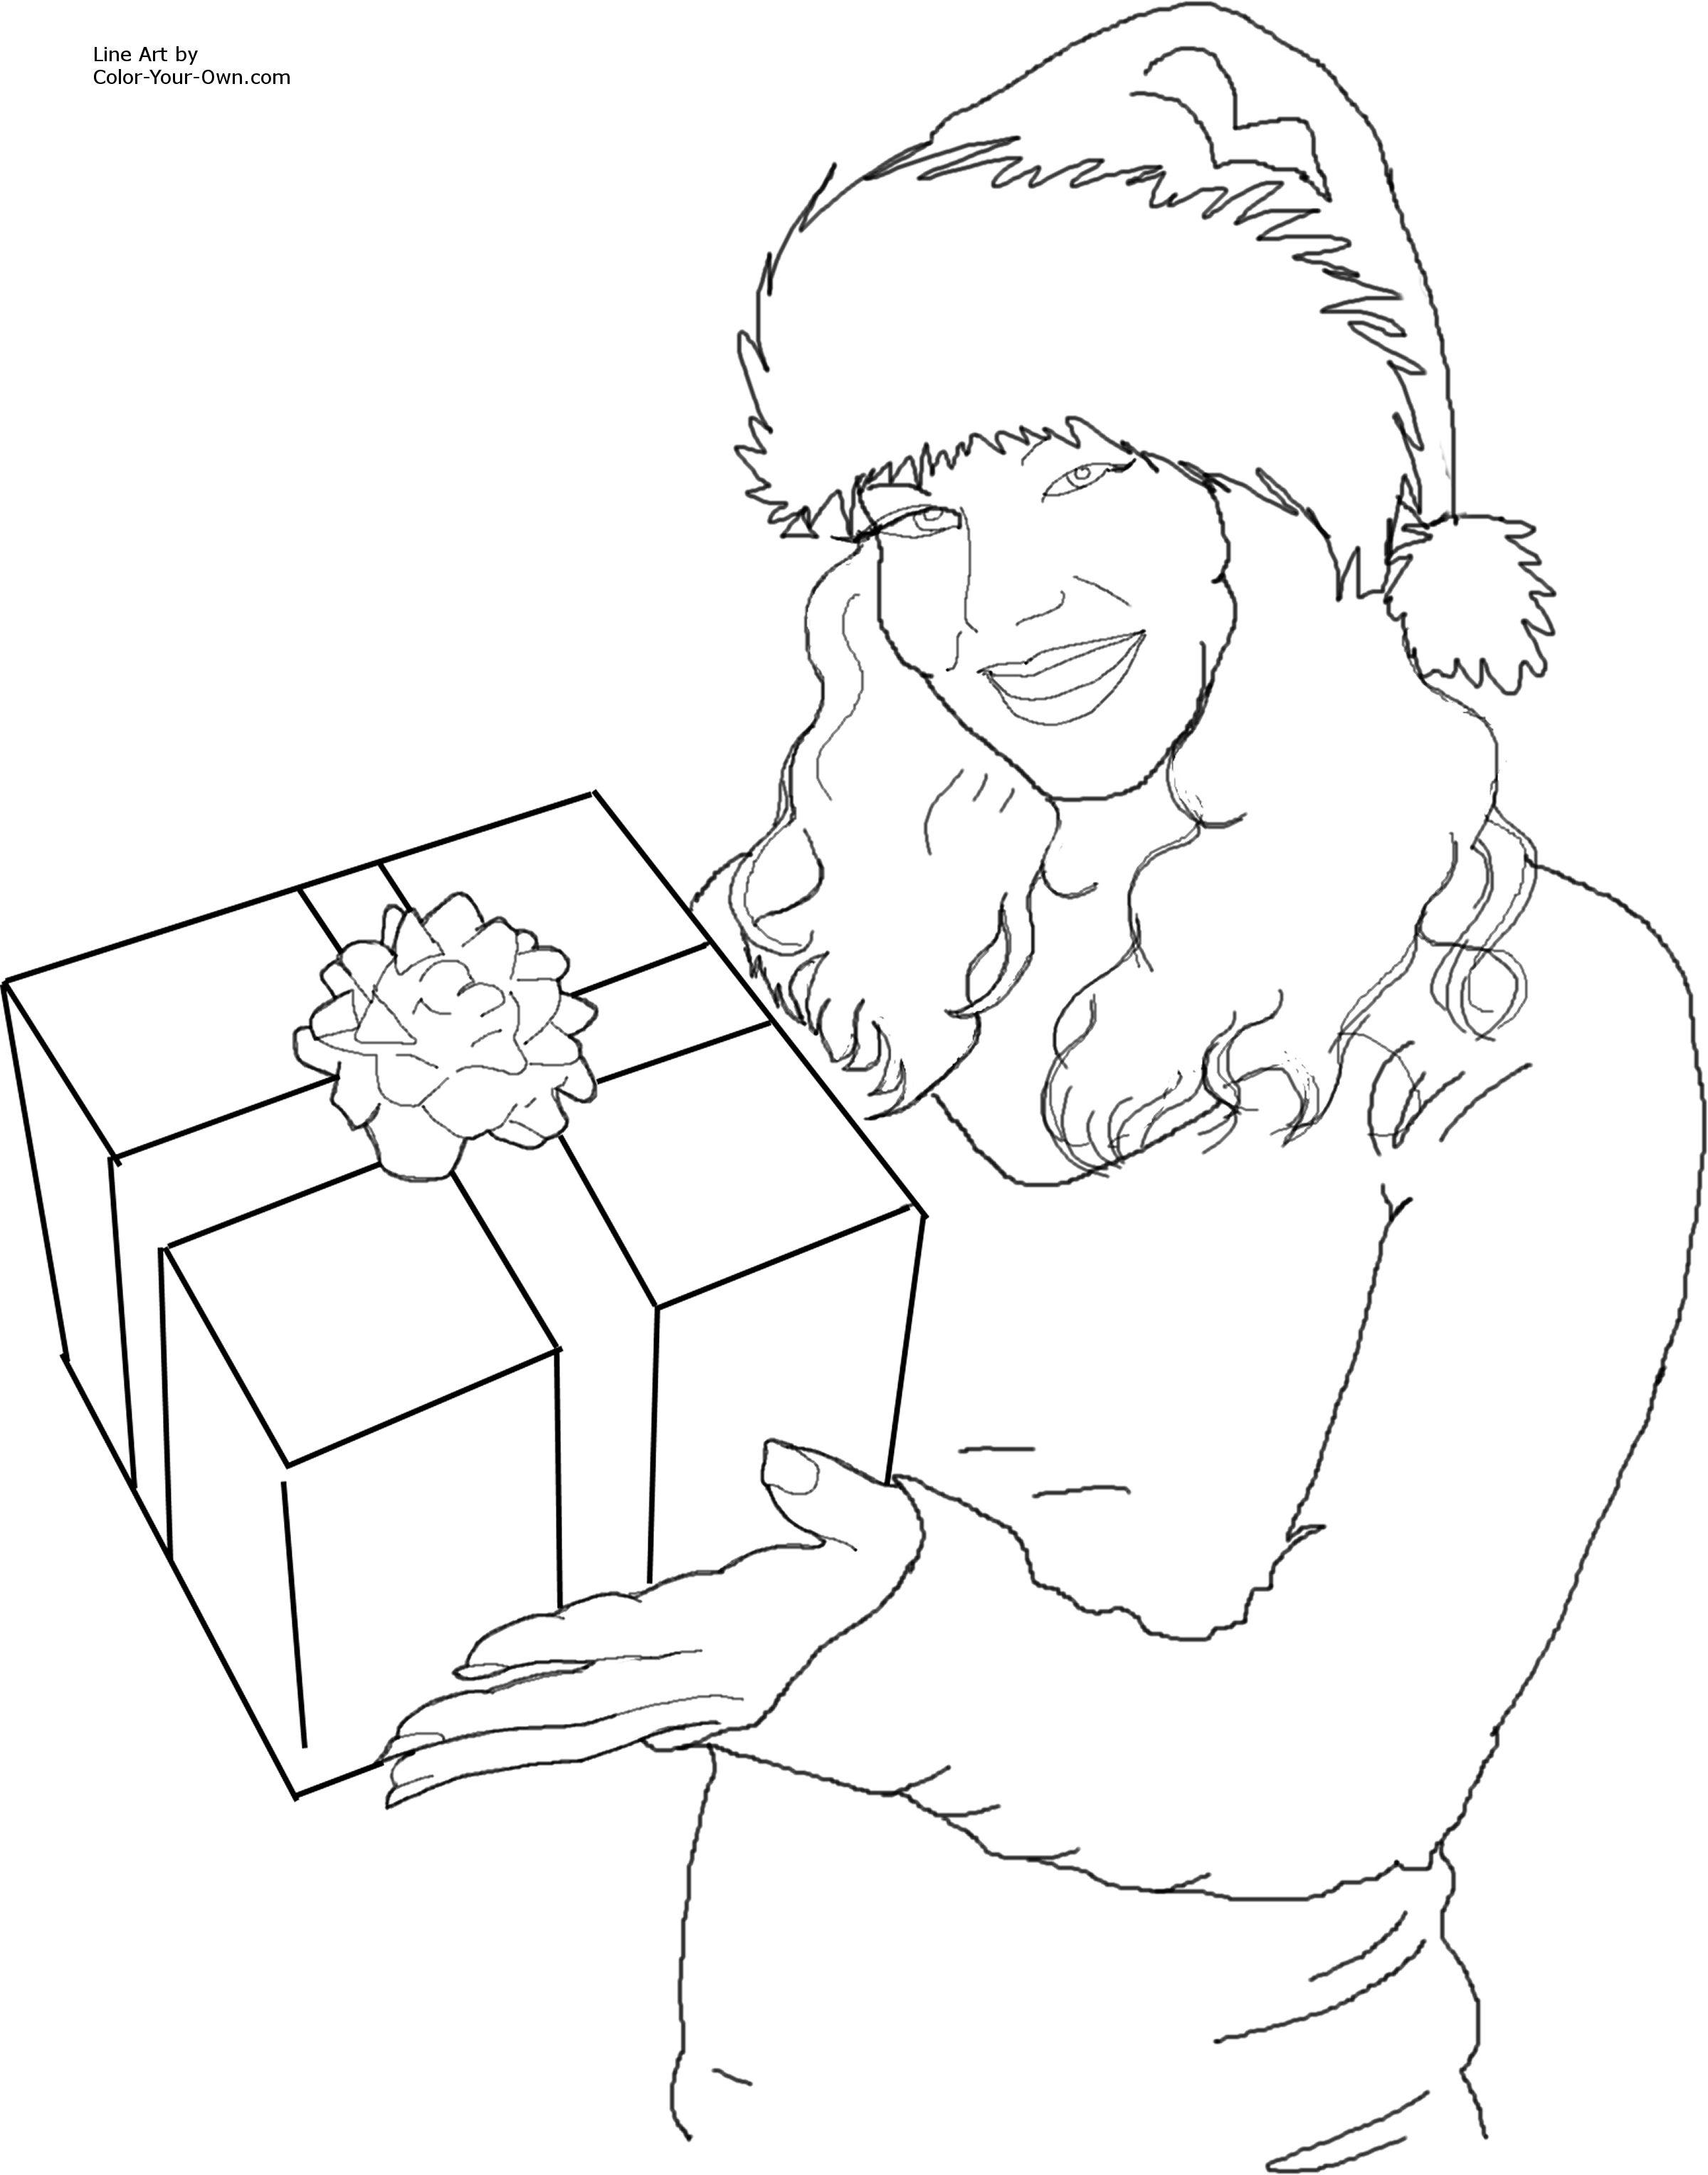 Santa Hat Drawing at GetDrawings.com | Free for personal use Santa ...